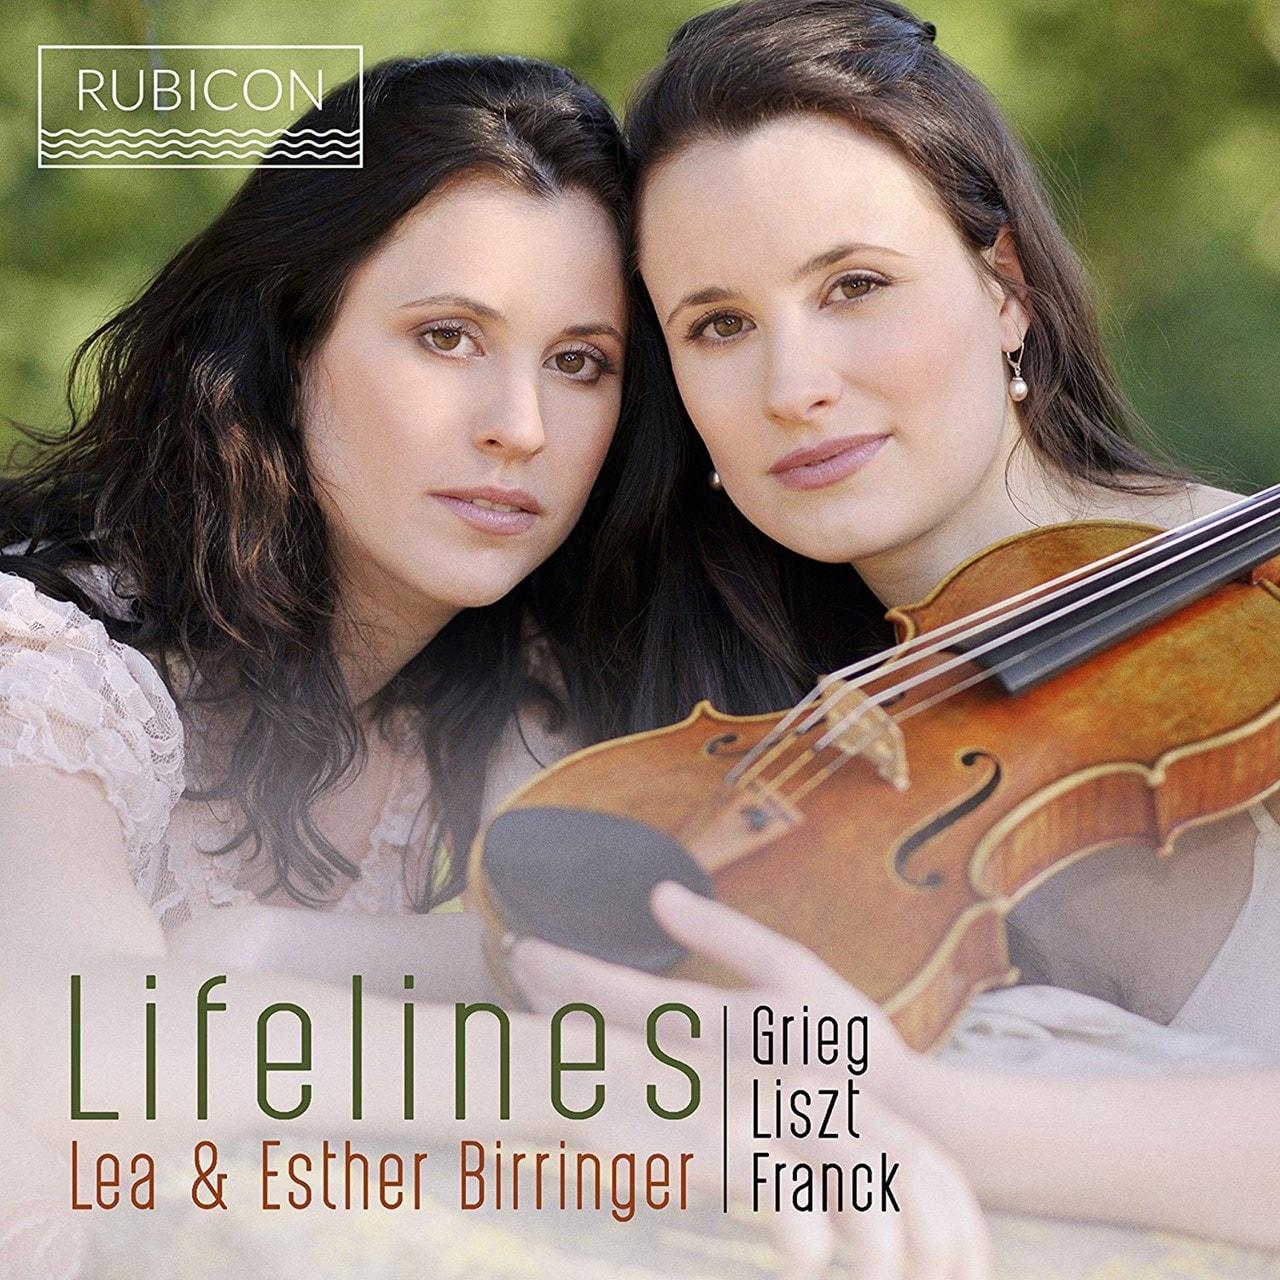 Lea & Esther Birringer: Lifelines - 1